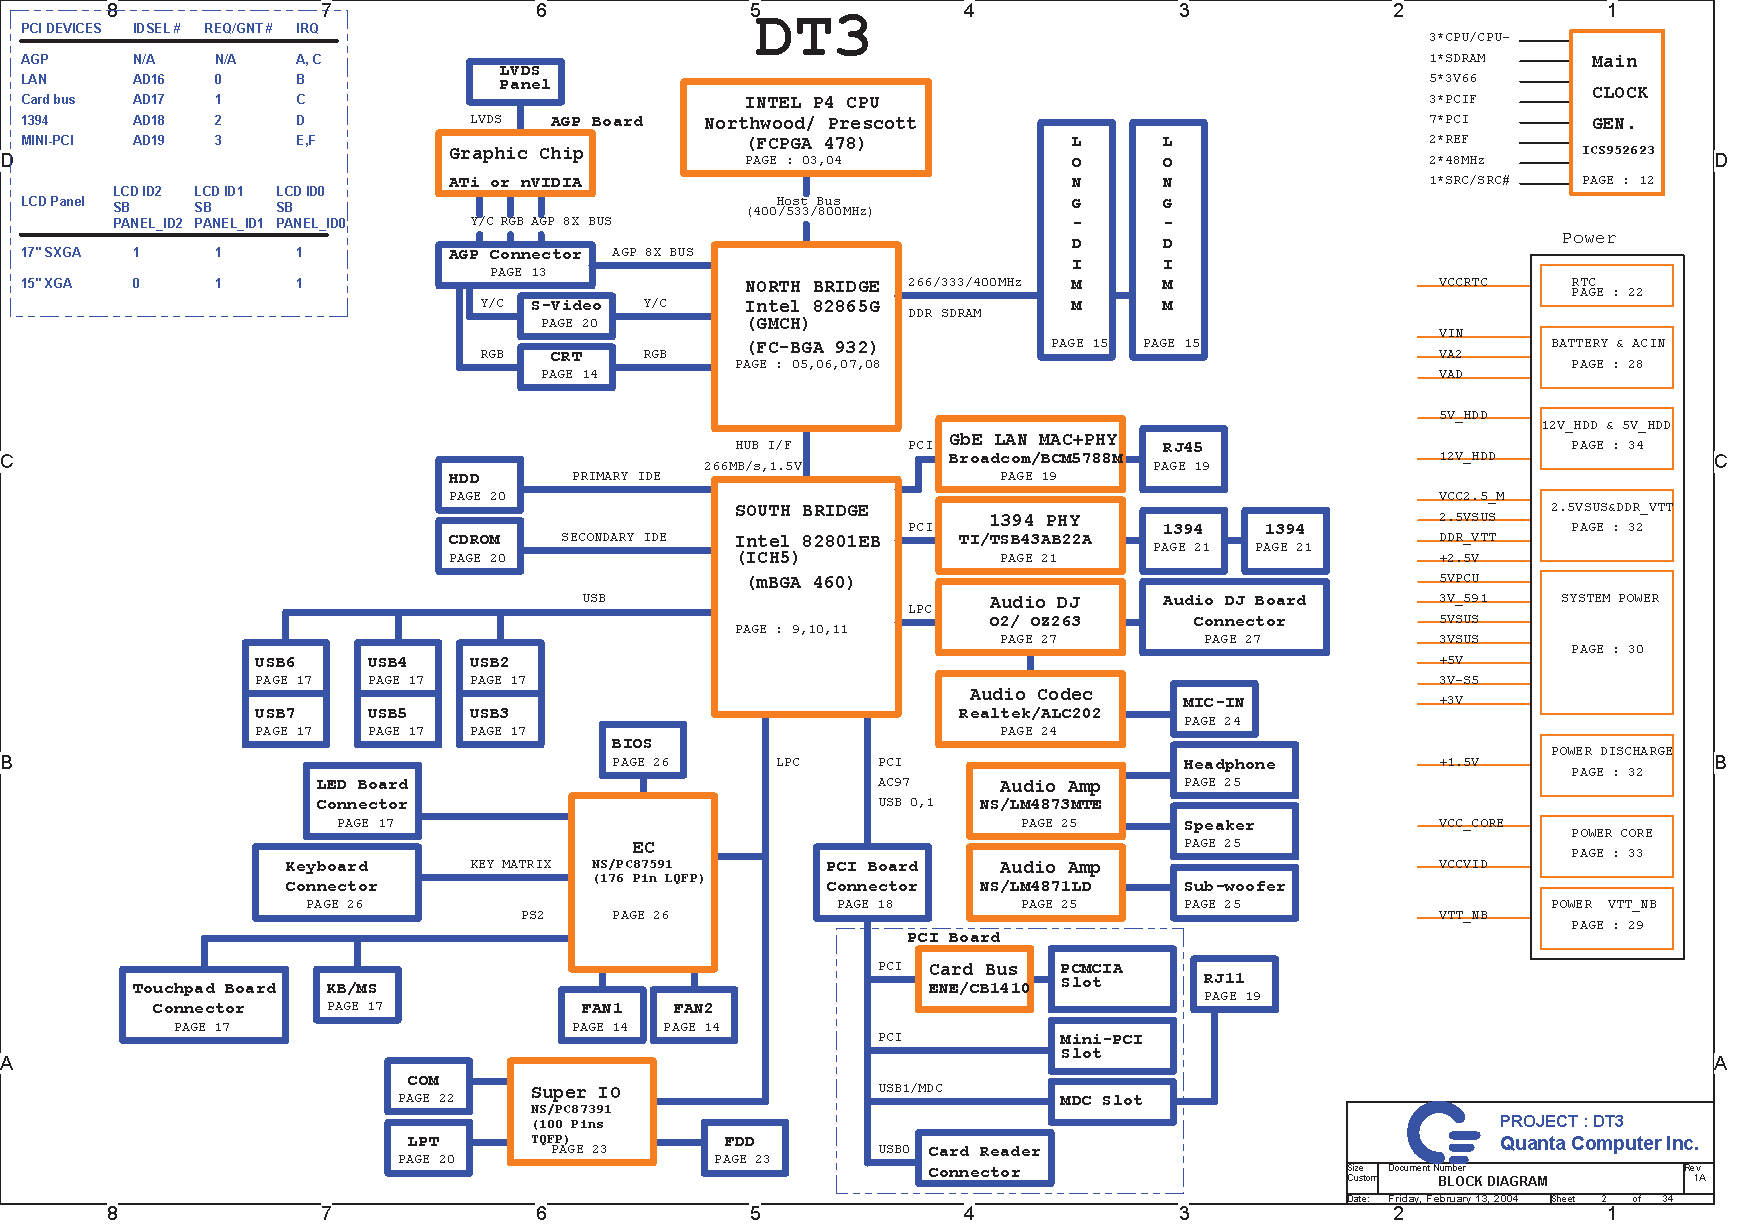 hight resolution of the motherboard schematicfor acer aspire 1710 laptop notebook cpu intel p4 cpu northwood prescott north bridge intel 82865g gmch south bridge intel